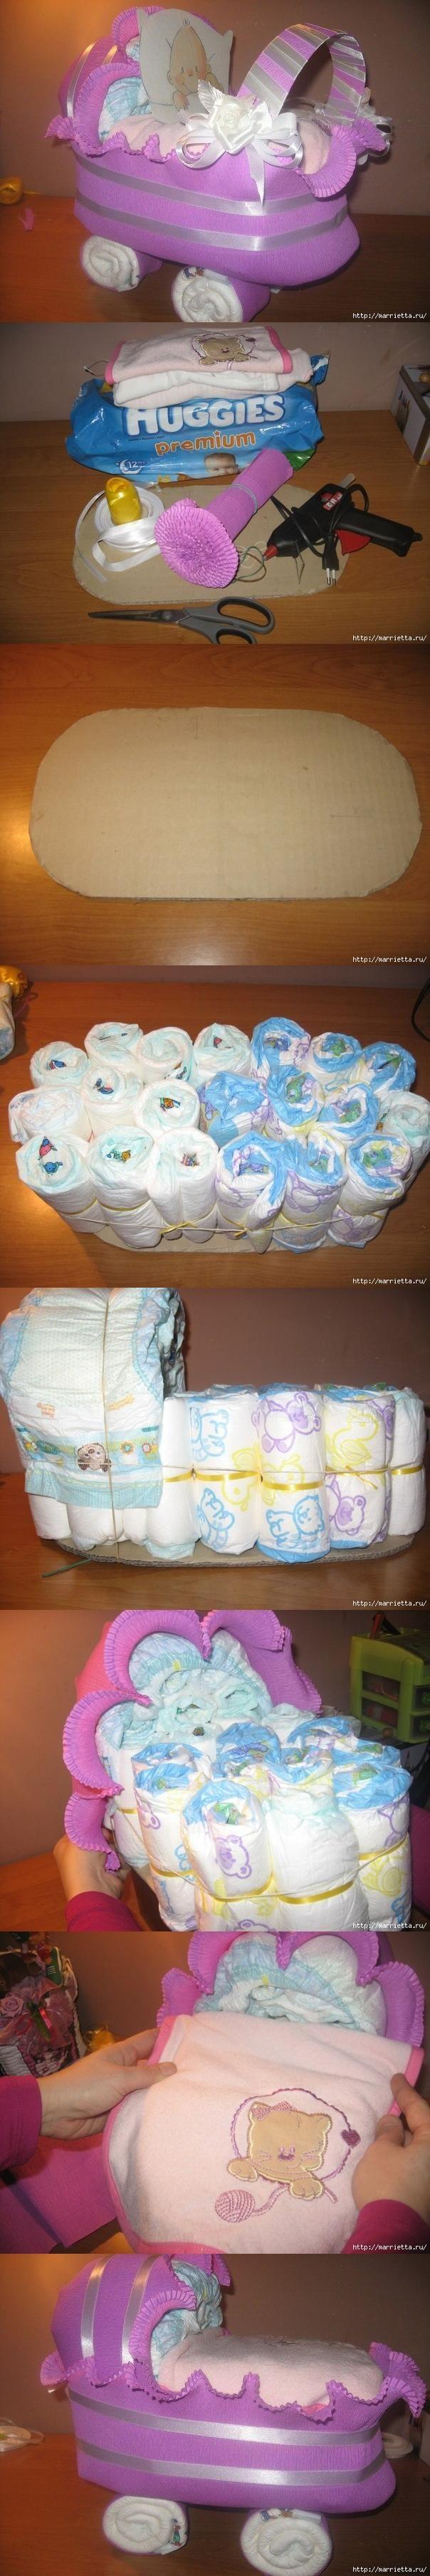 DIY Diaper Newborn Carrier LIKE Us on Facebook ==> https://www.facebook.com/UsefulDiy